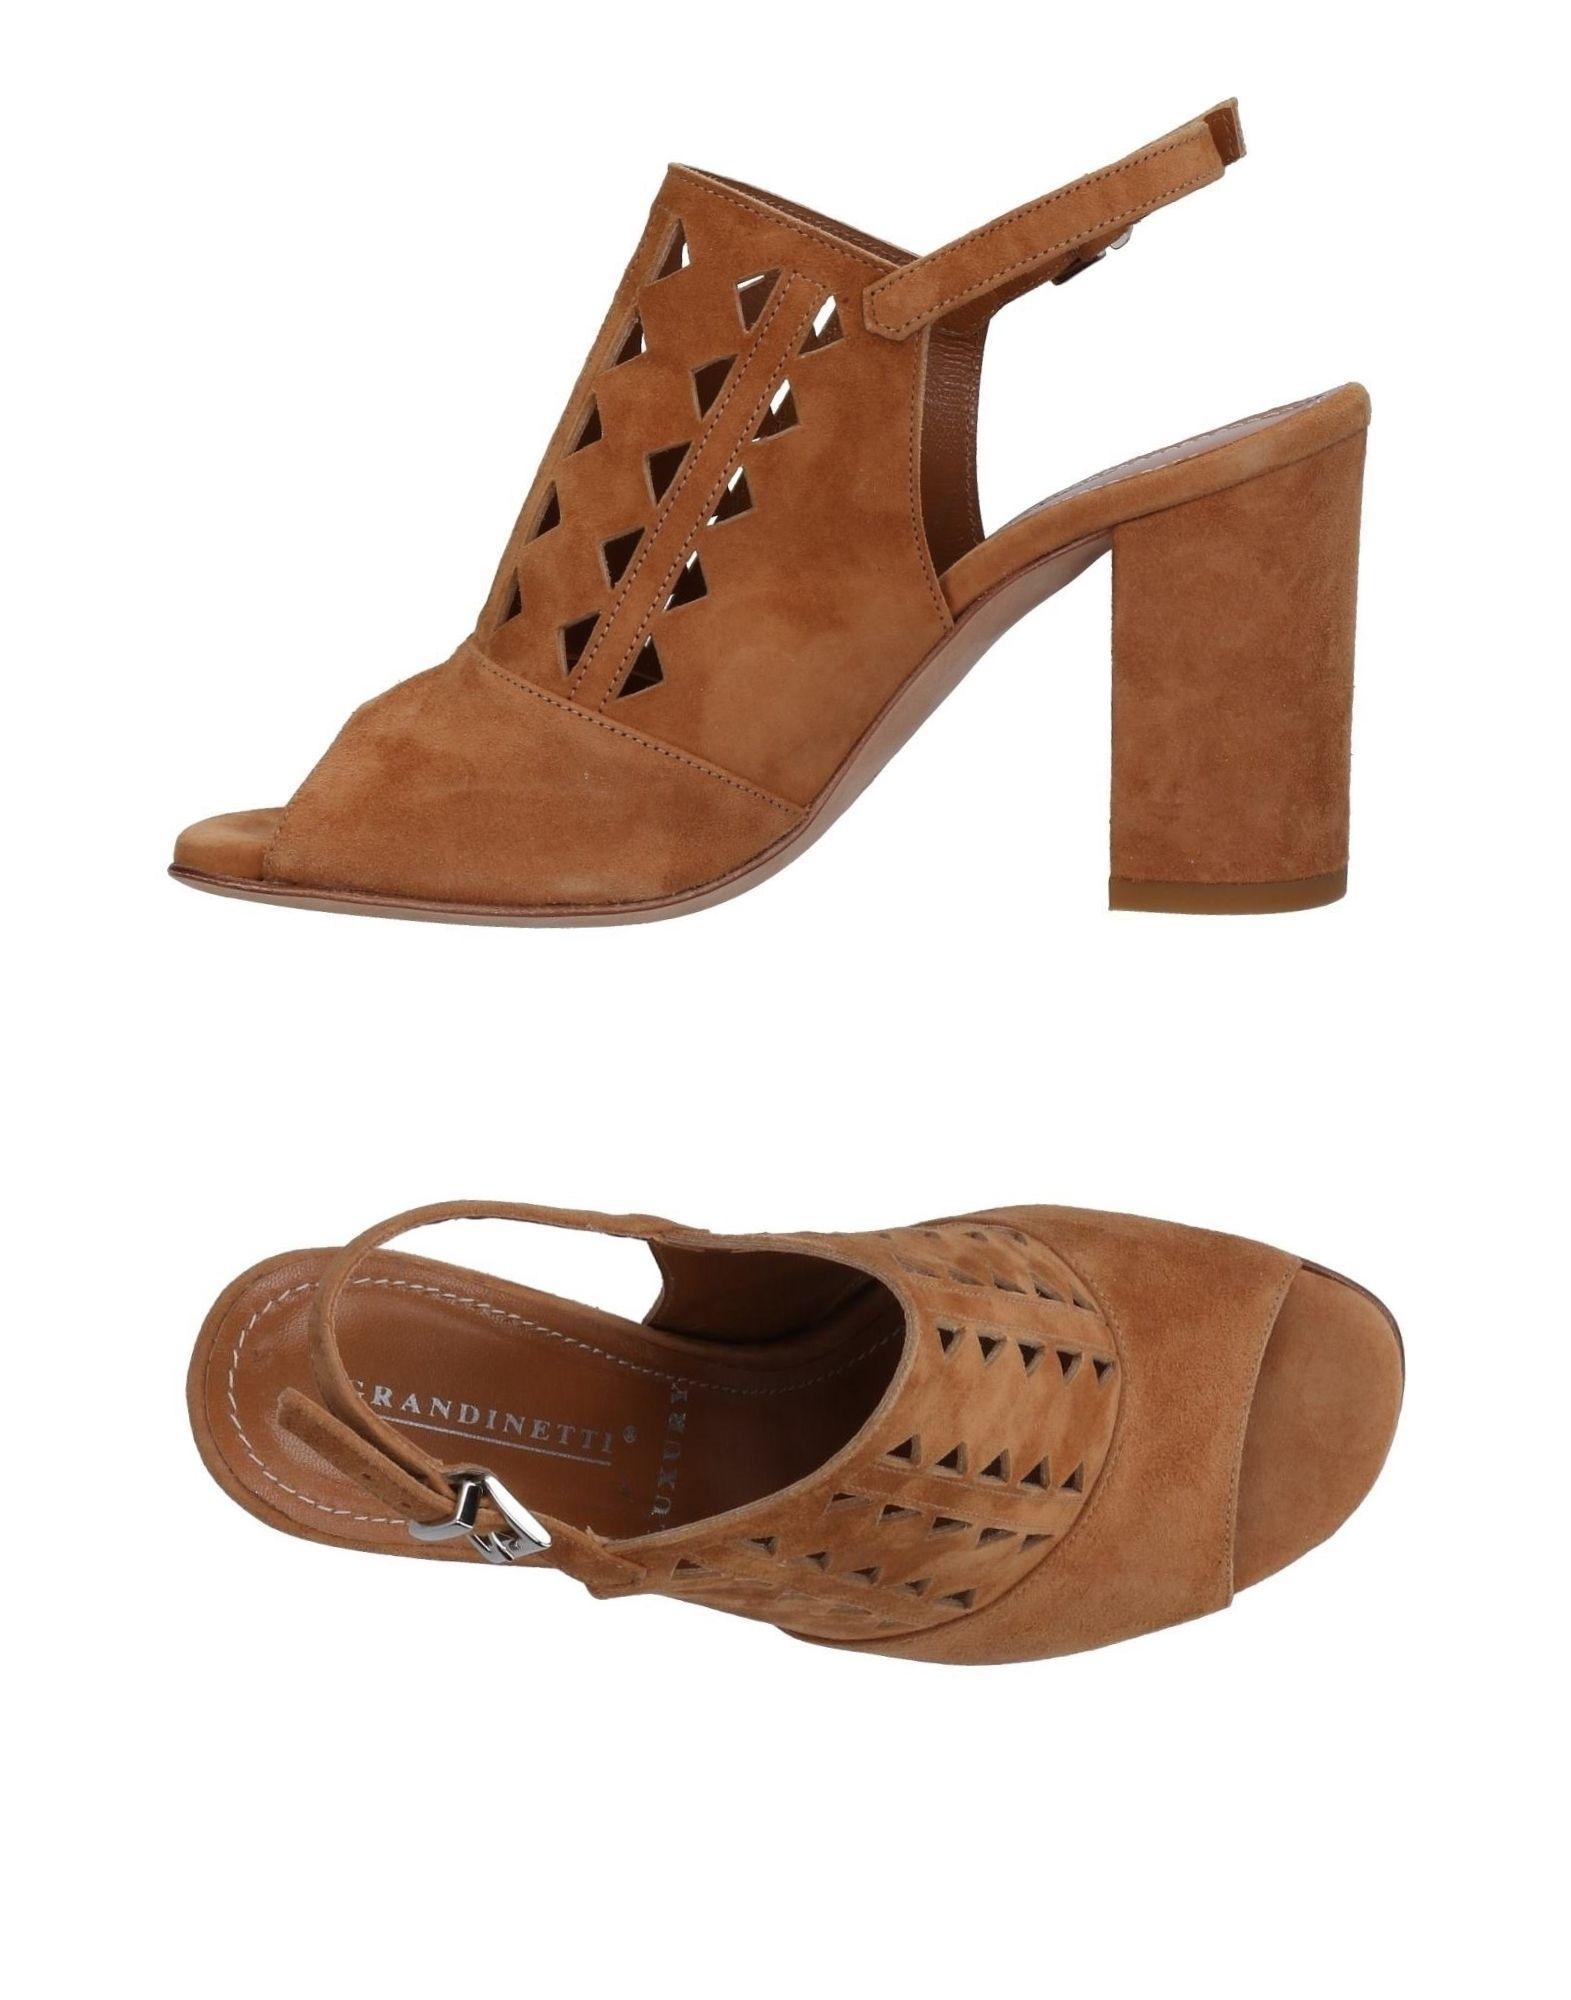 Grandinetti Sandalen Damen Qualität  11462492IT Gute Qualität Damen beliebte Schuhe 1b47f6